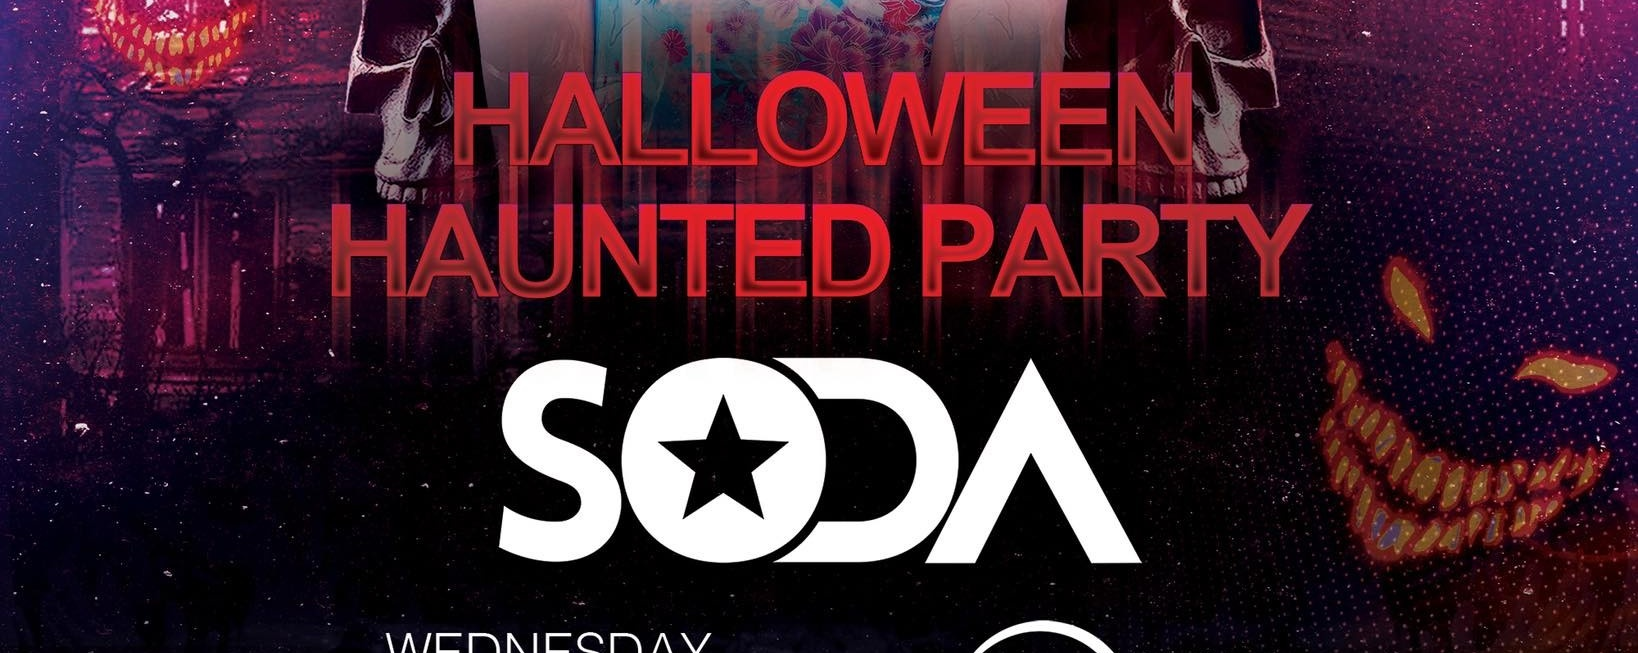 Paul van Dyk & DJ Soda at Cove Manila   Halloween Haunted Party